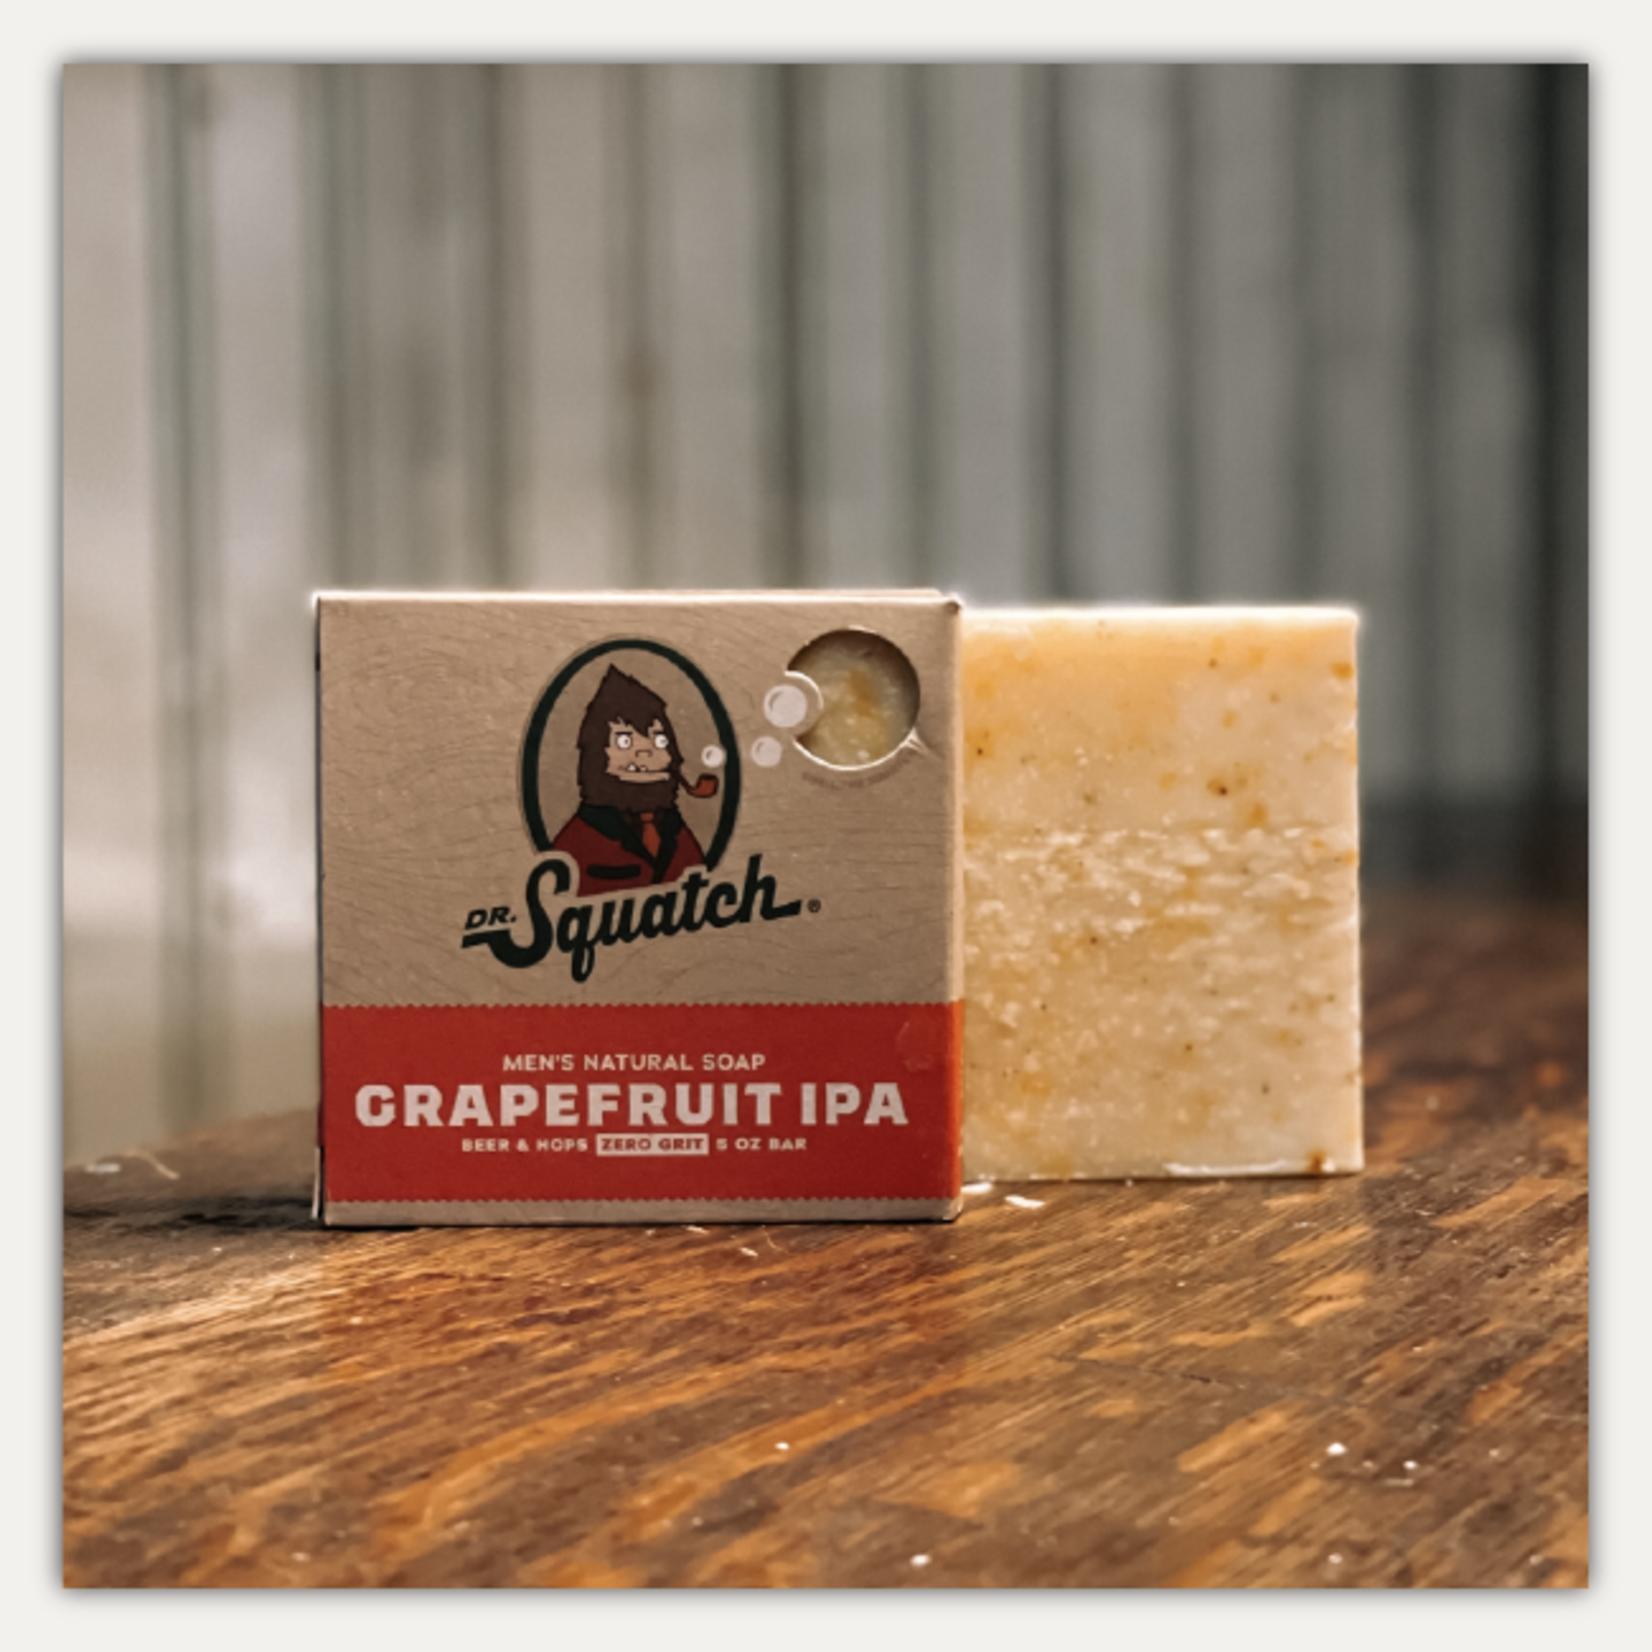 Dr. Squatch Bar Soap, Grapefruit IPA